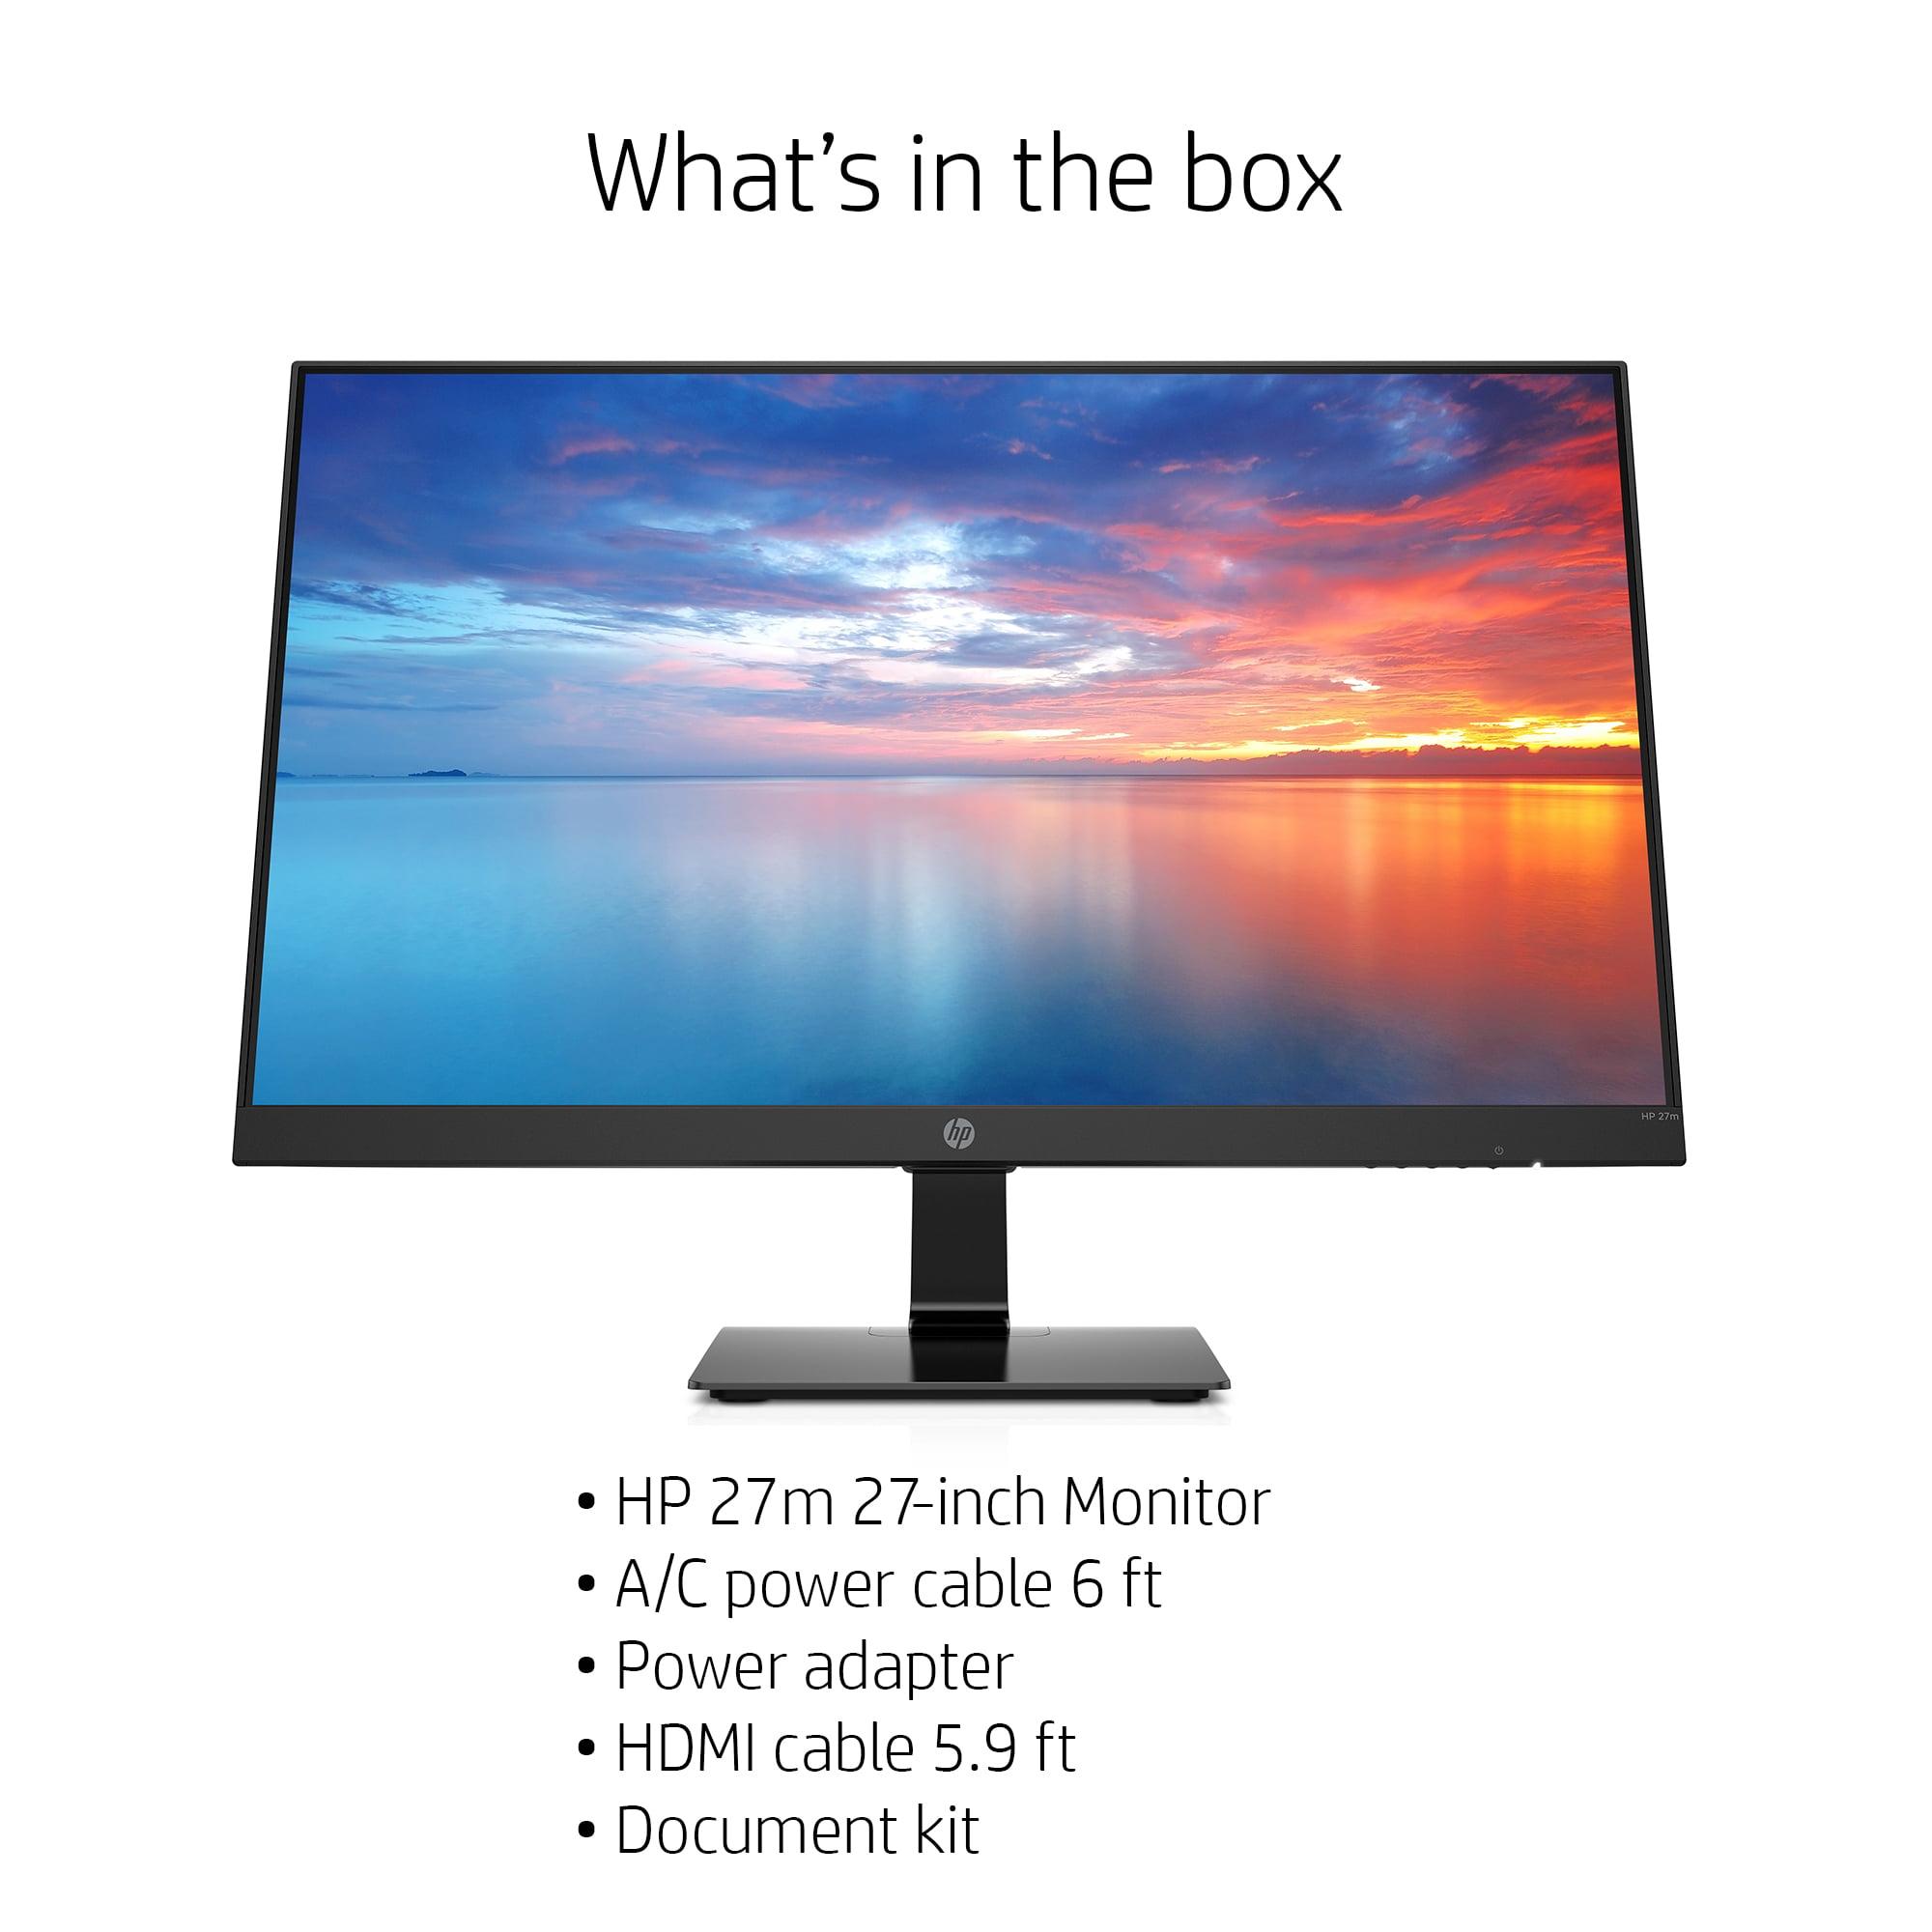 Hewlett Packard Hp 8m 8-inch Monitor